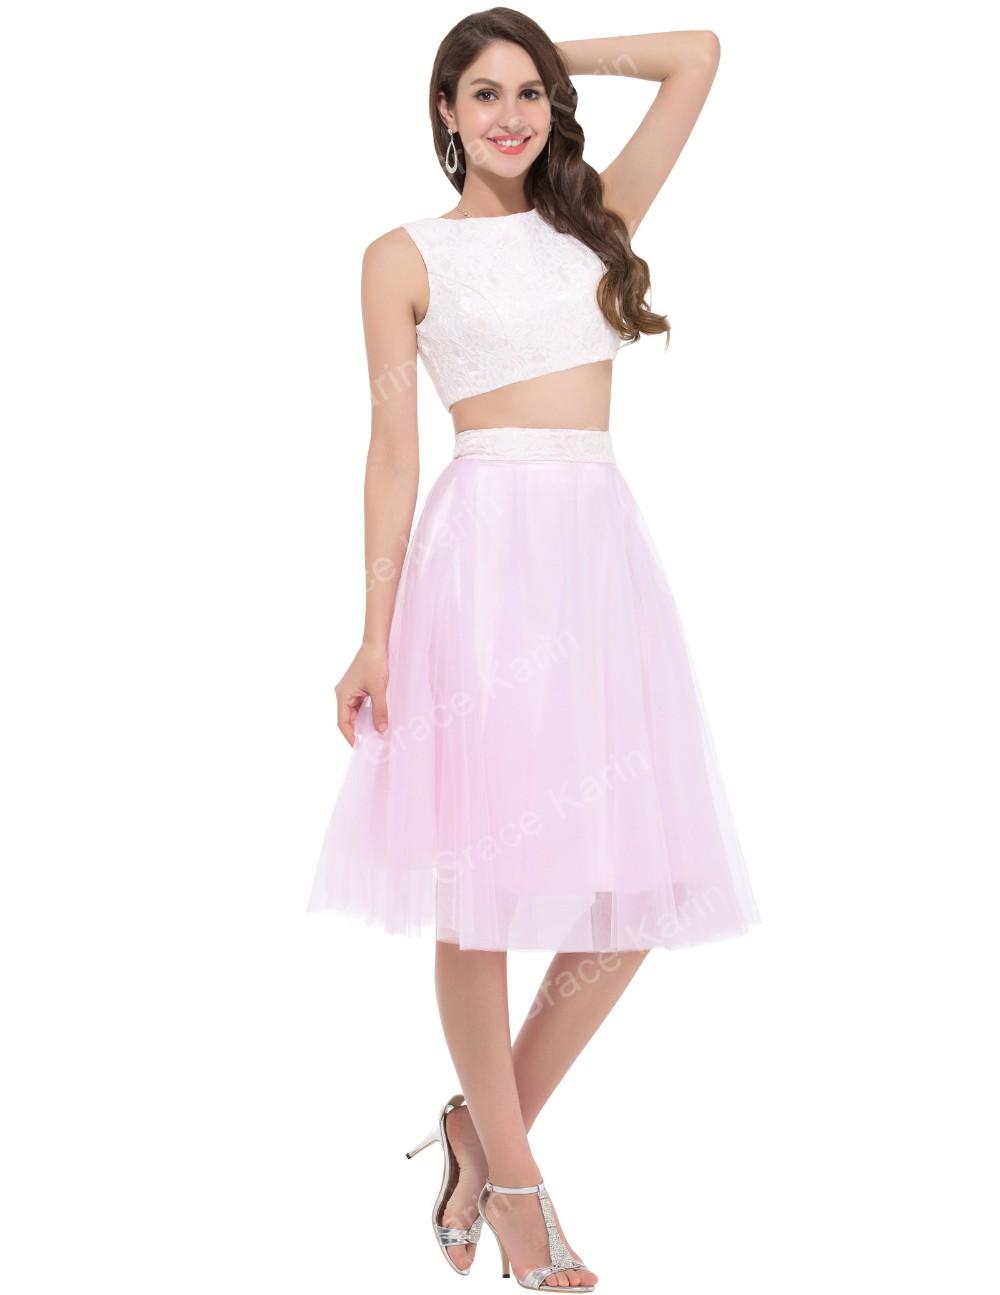 Gracia Karin 2 dos piezas Vestidos de baile sexy Pink Encaje satén ...